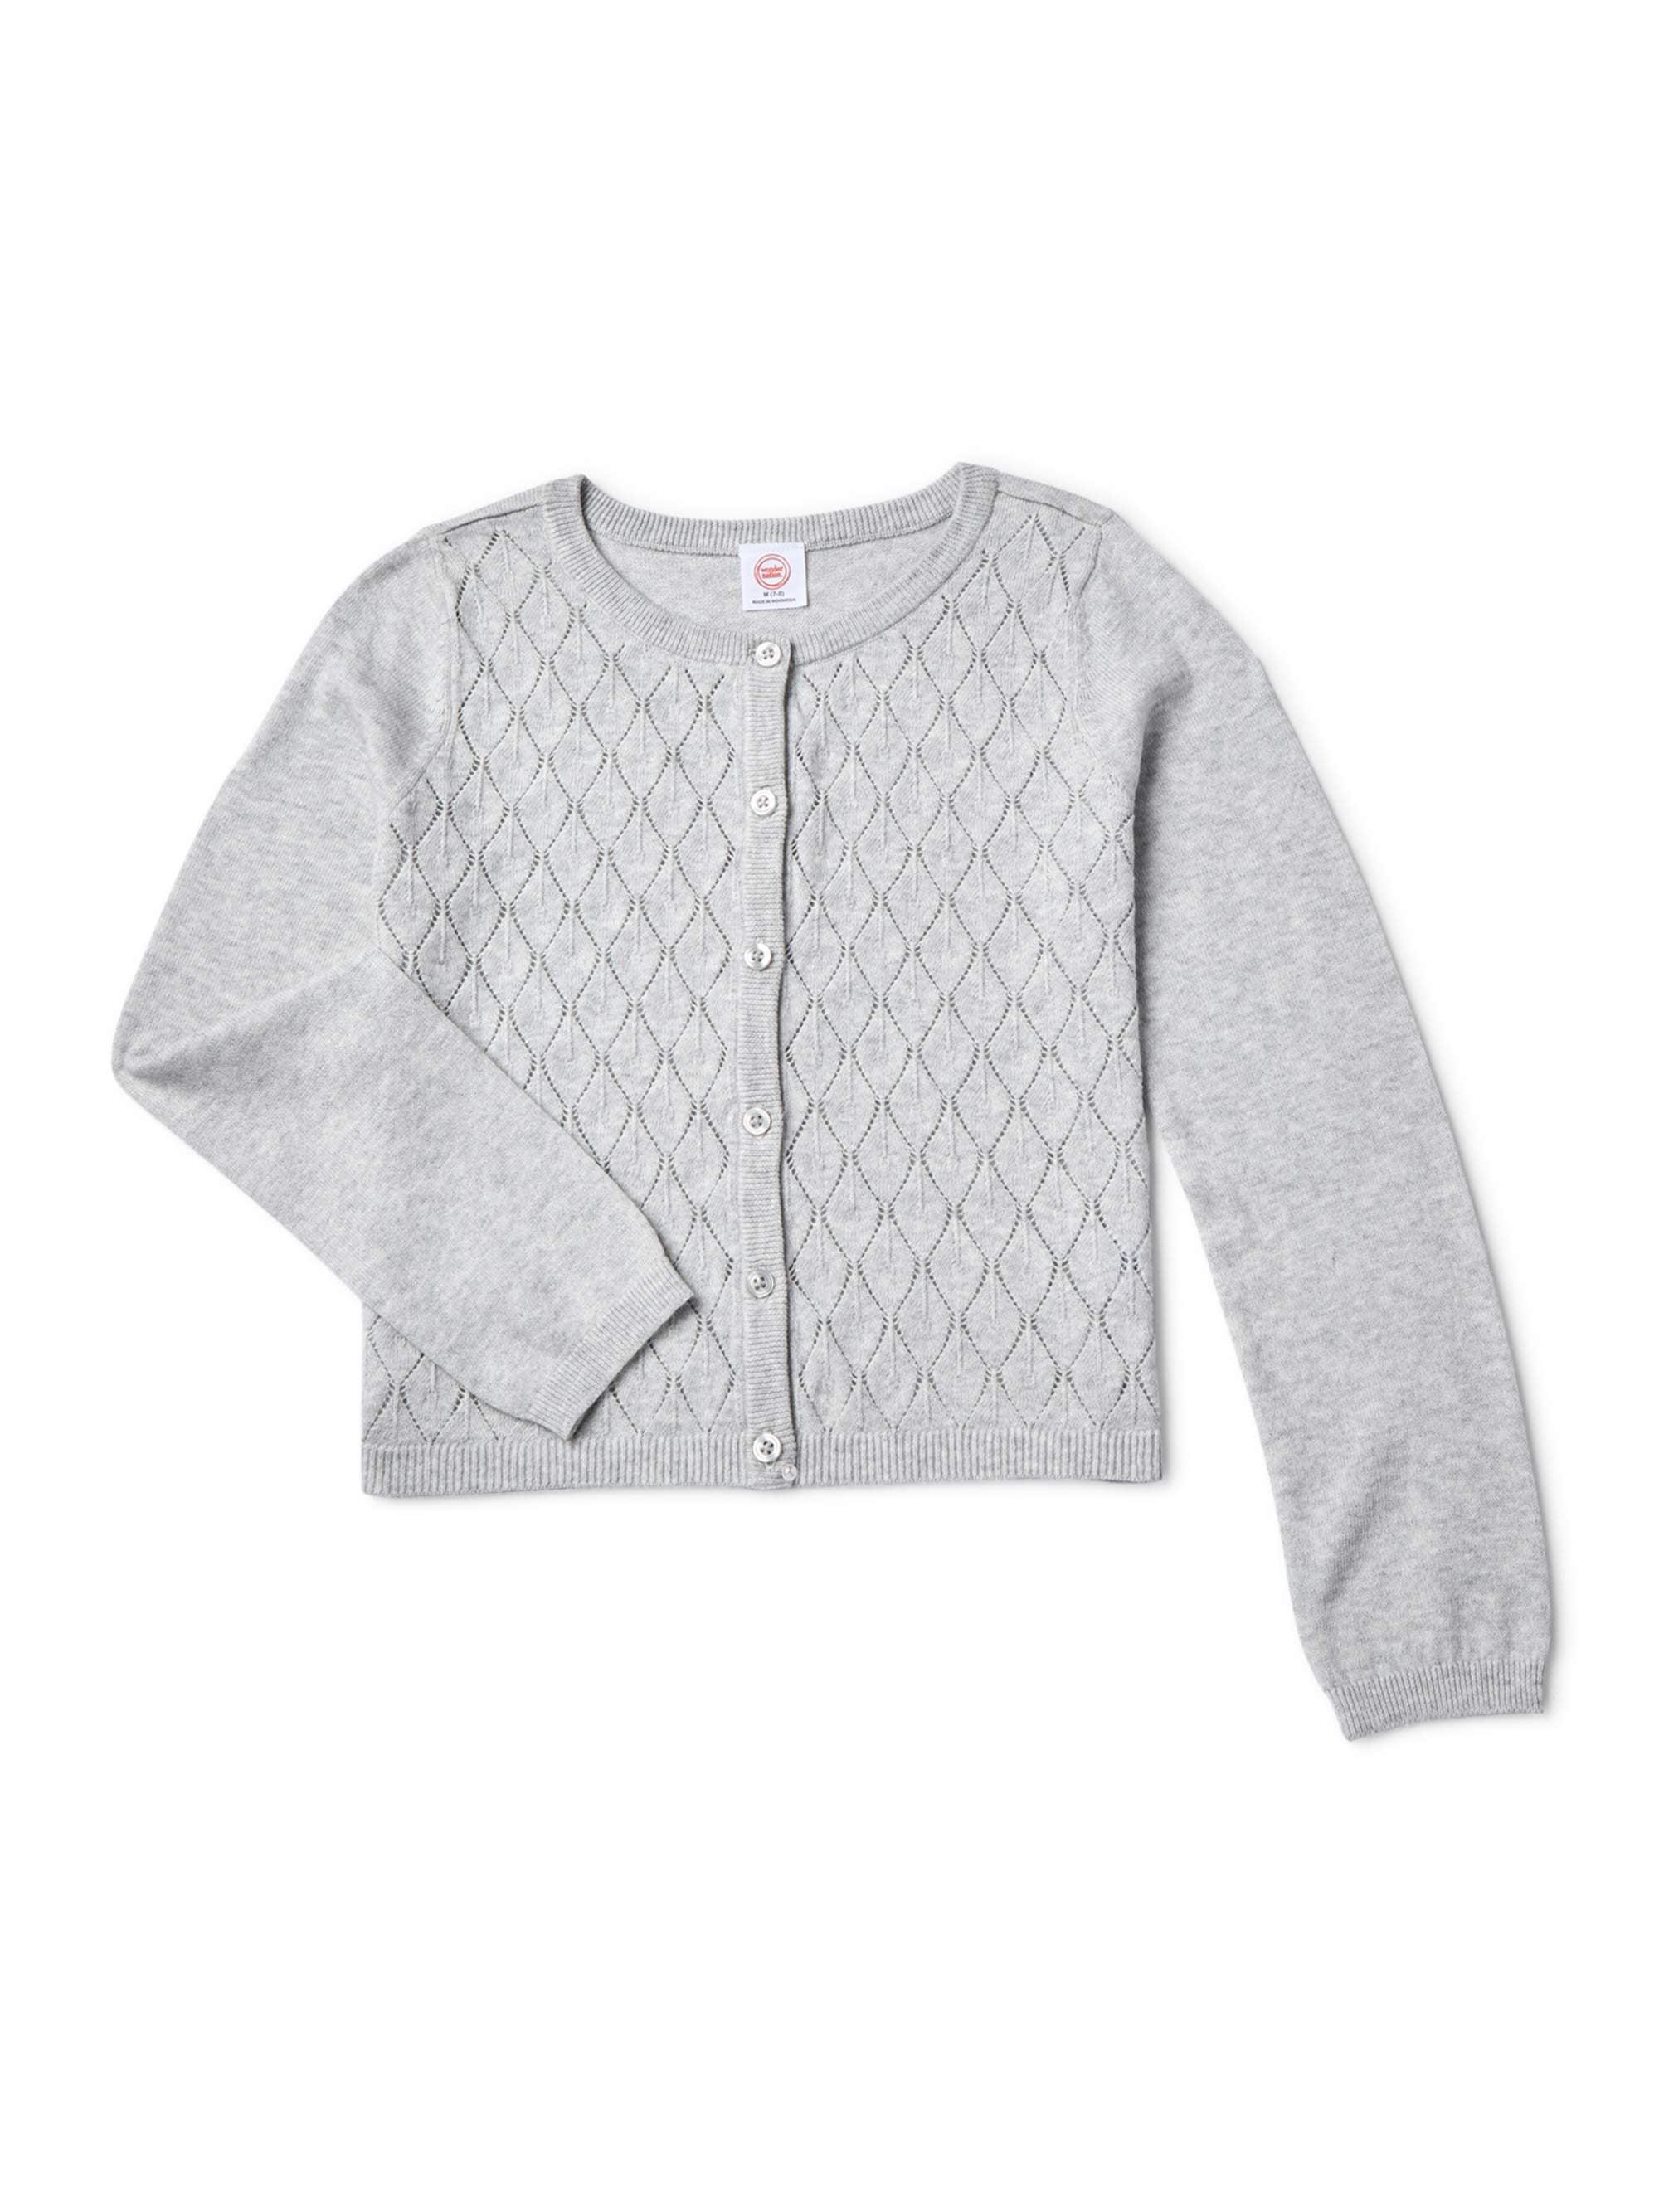 Arizona Flag Printed Baby Girls Kids Crew Neck Sweater Long Sleeve Warm Knit Jumper Top